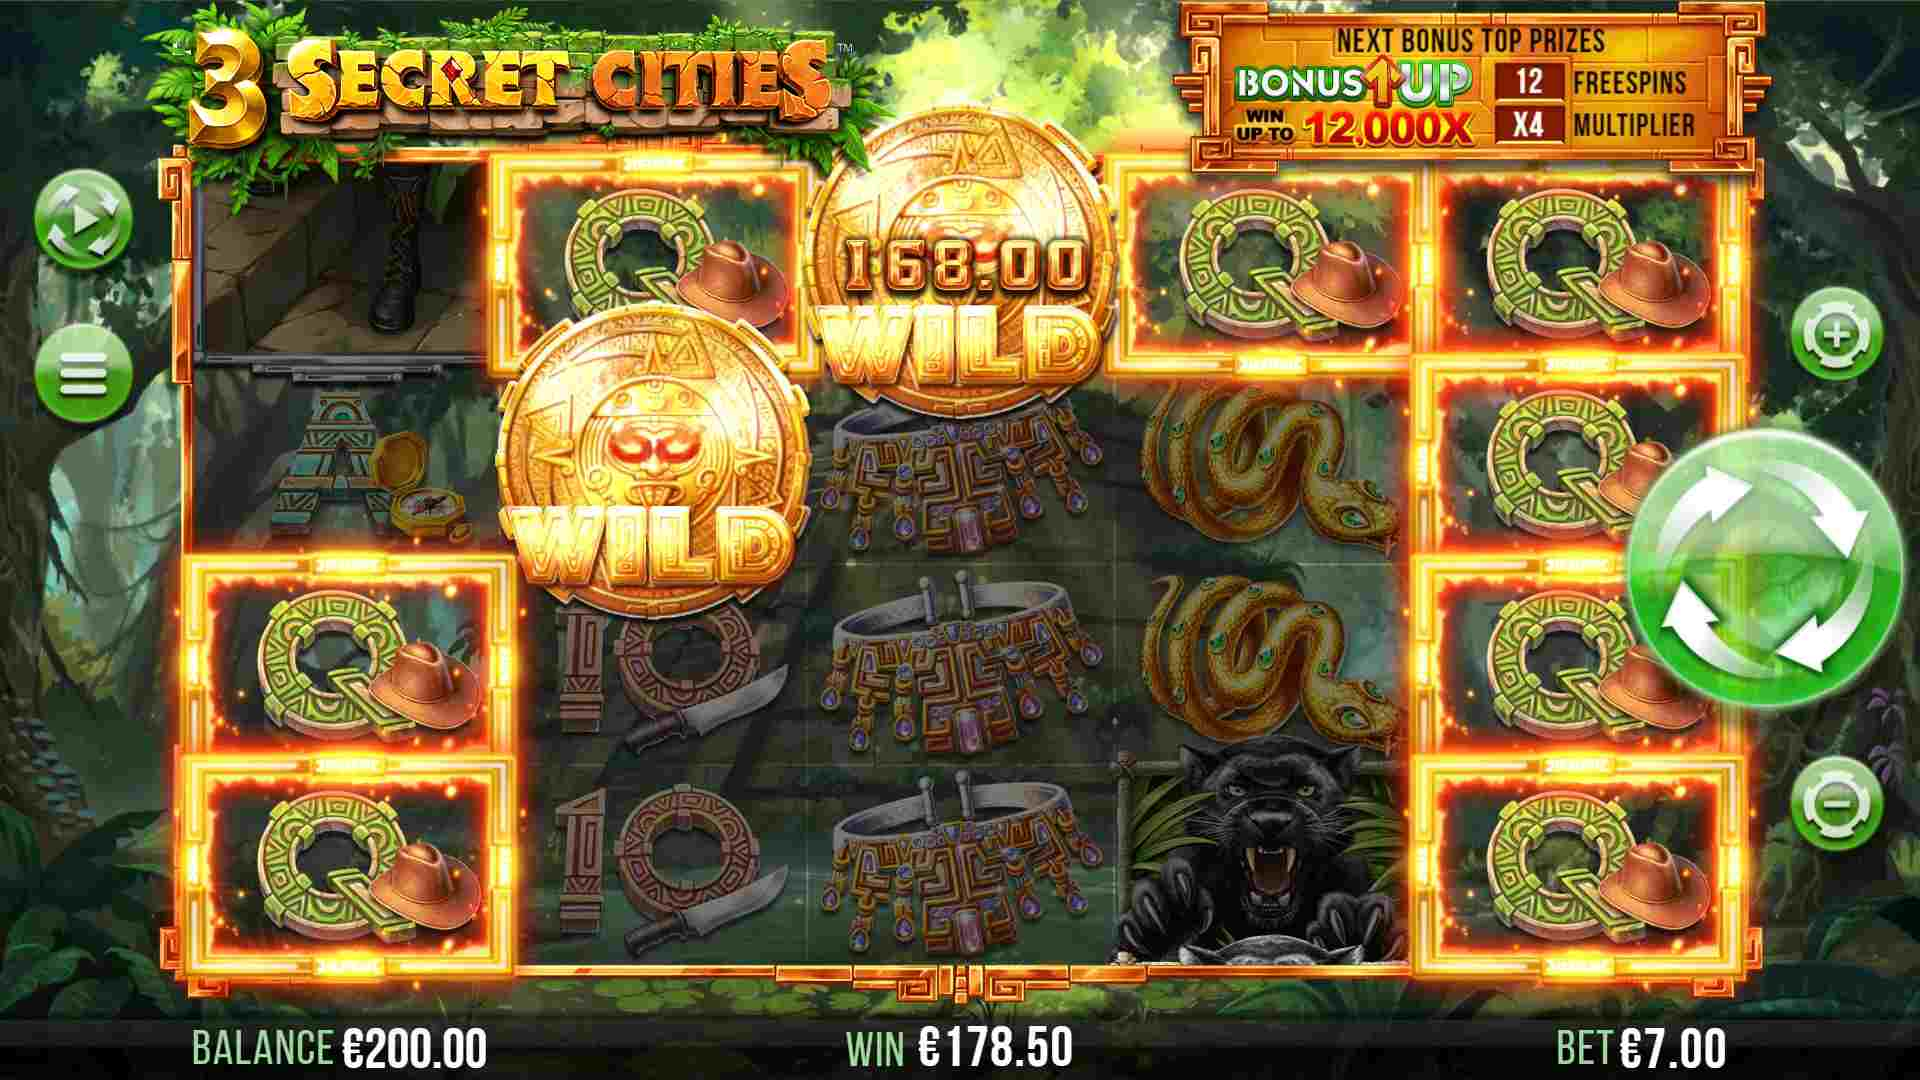 3 Secret Cities Gameplay